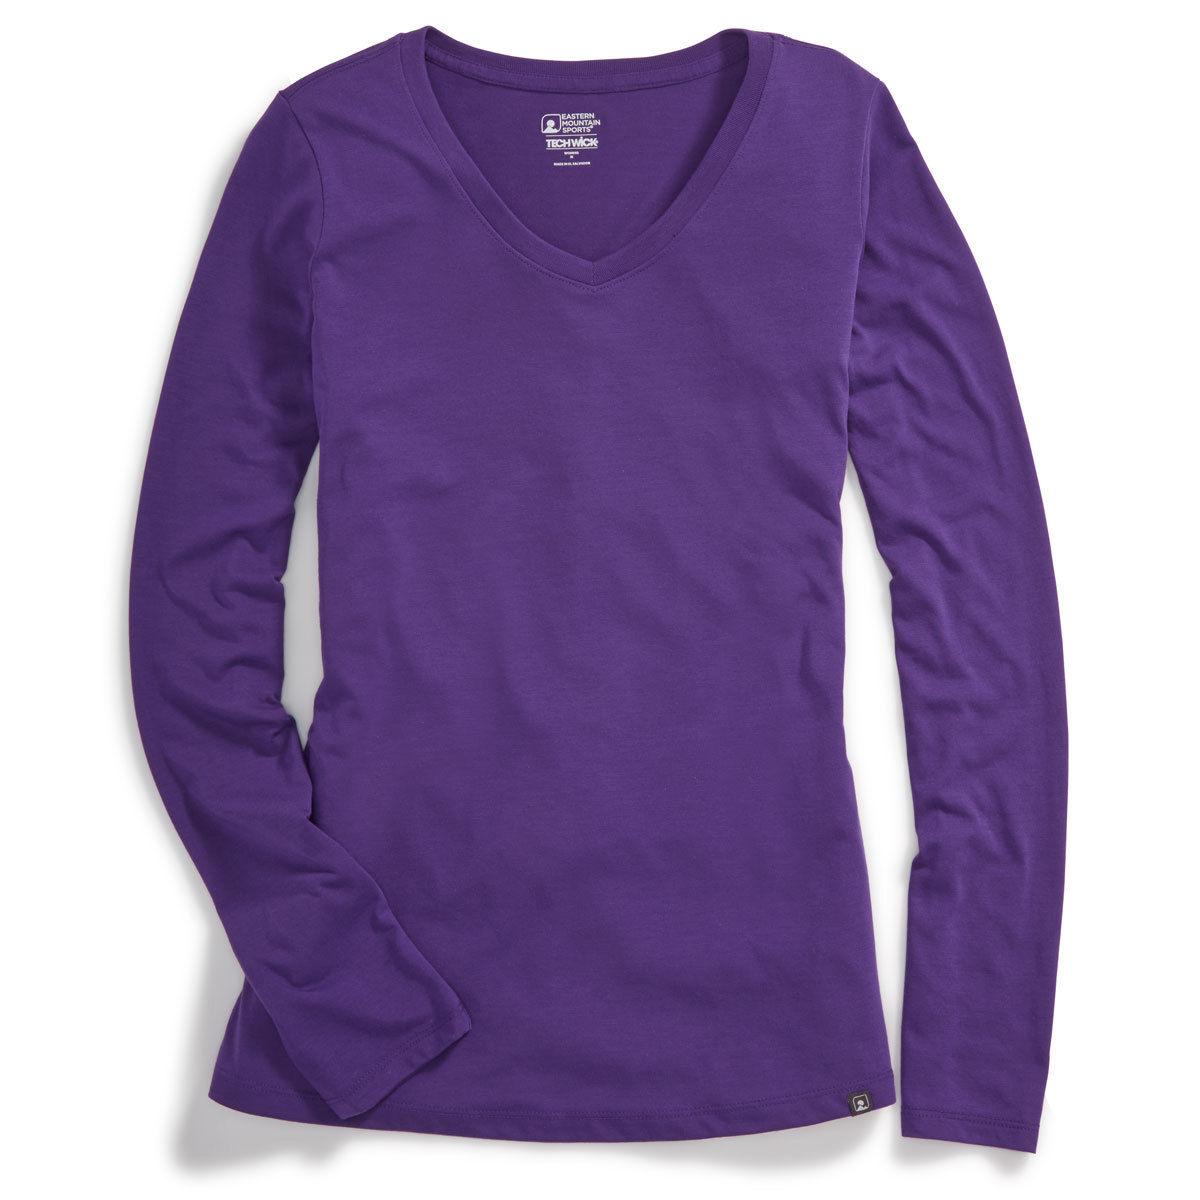 Emsa(R) Women's Techwicka(R) Vital V-Neck Long-Sleeve Tee - Purple, XS